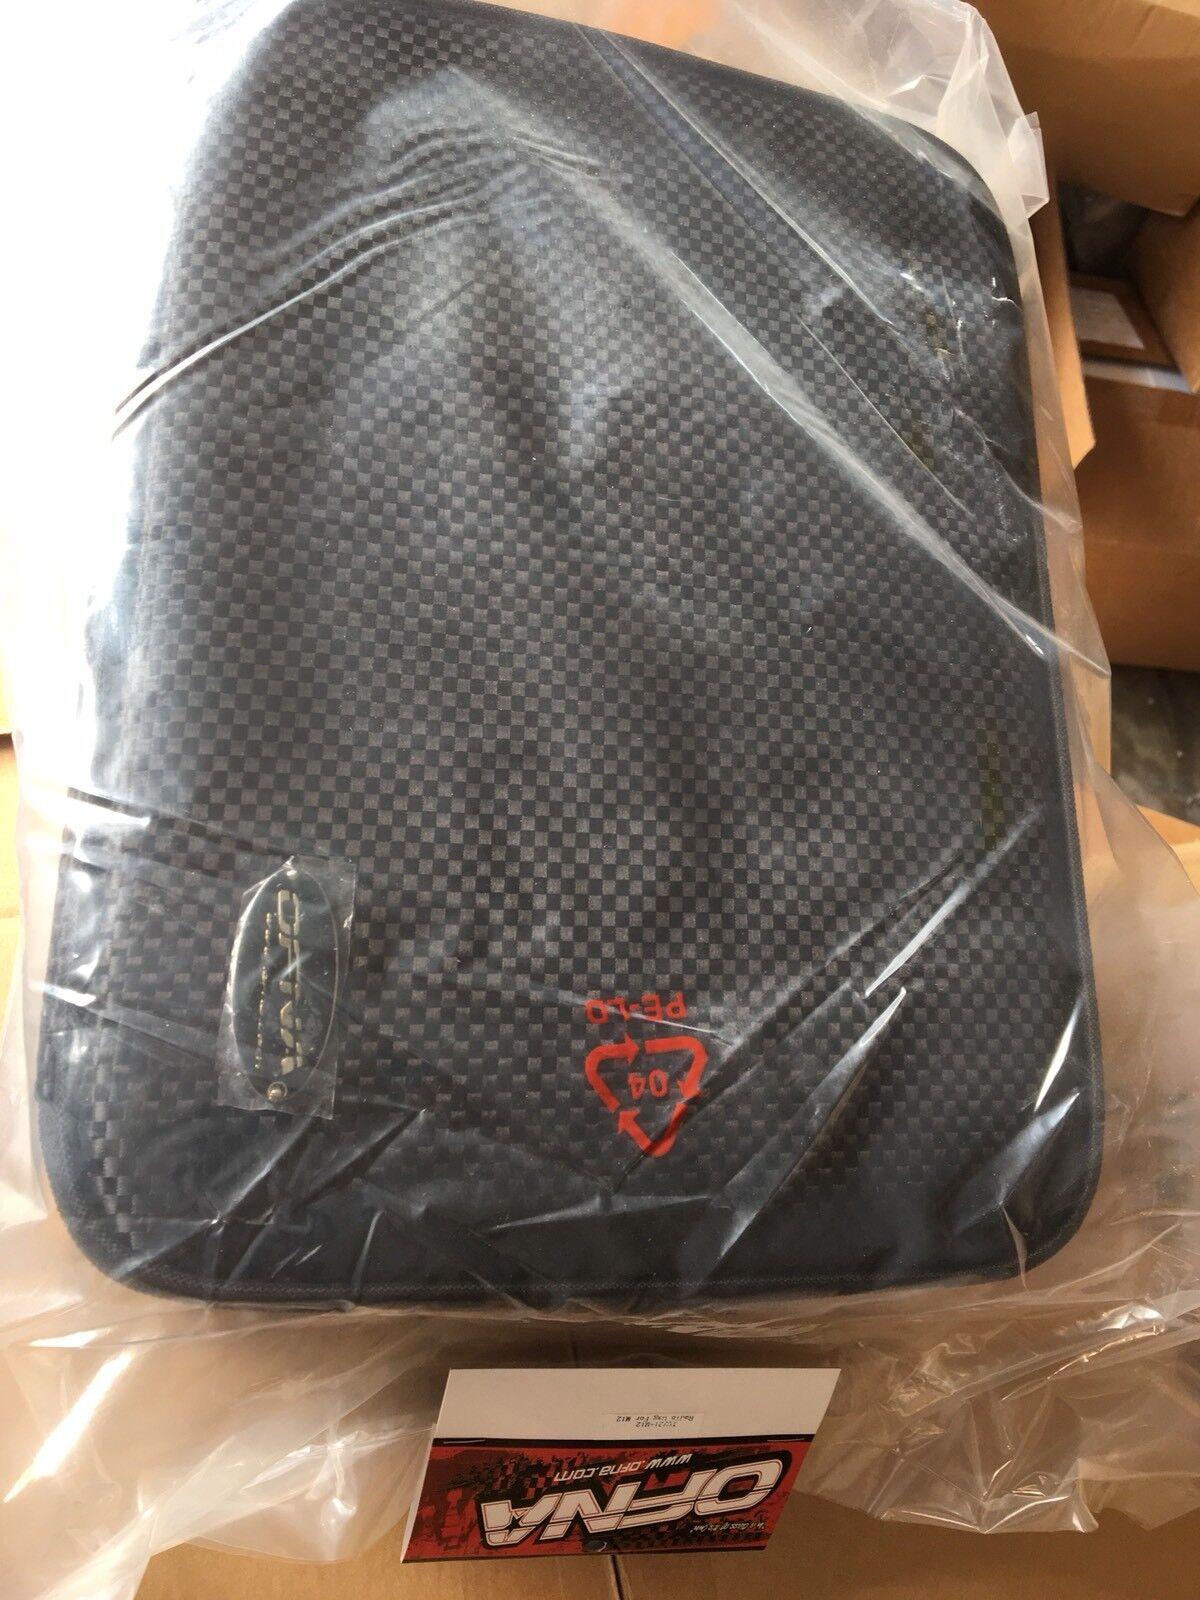 Ofna Radio Bag Carrying Case Case Case Airtronics M11x M11 Sanwa Team C e56865